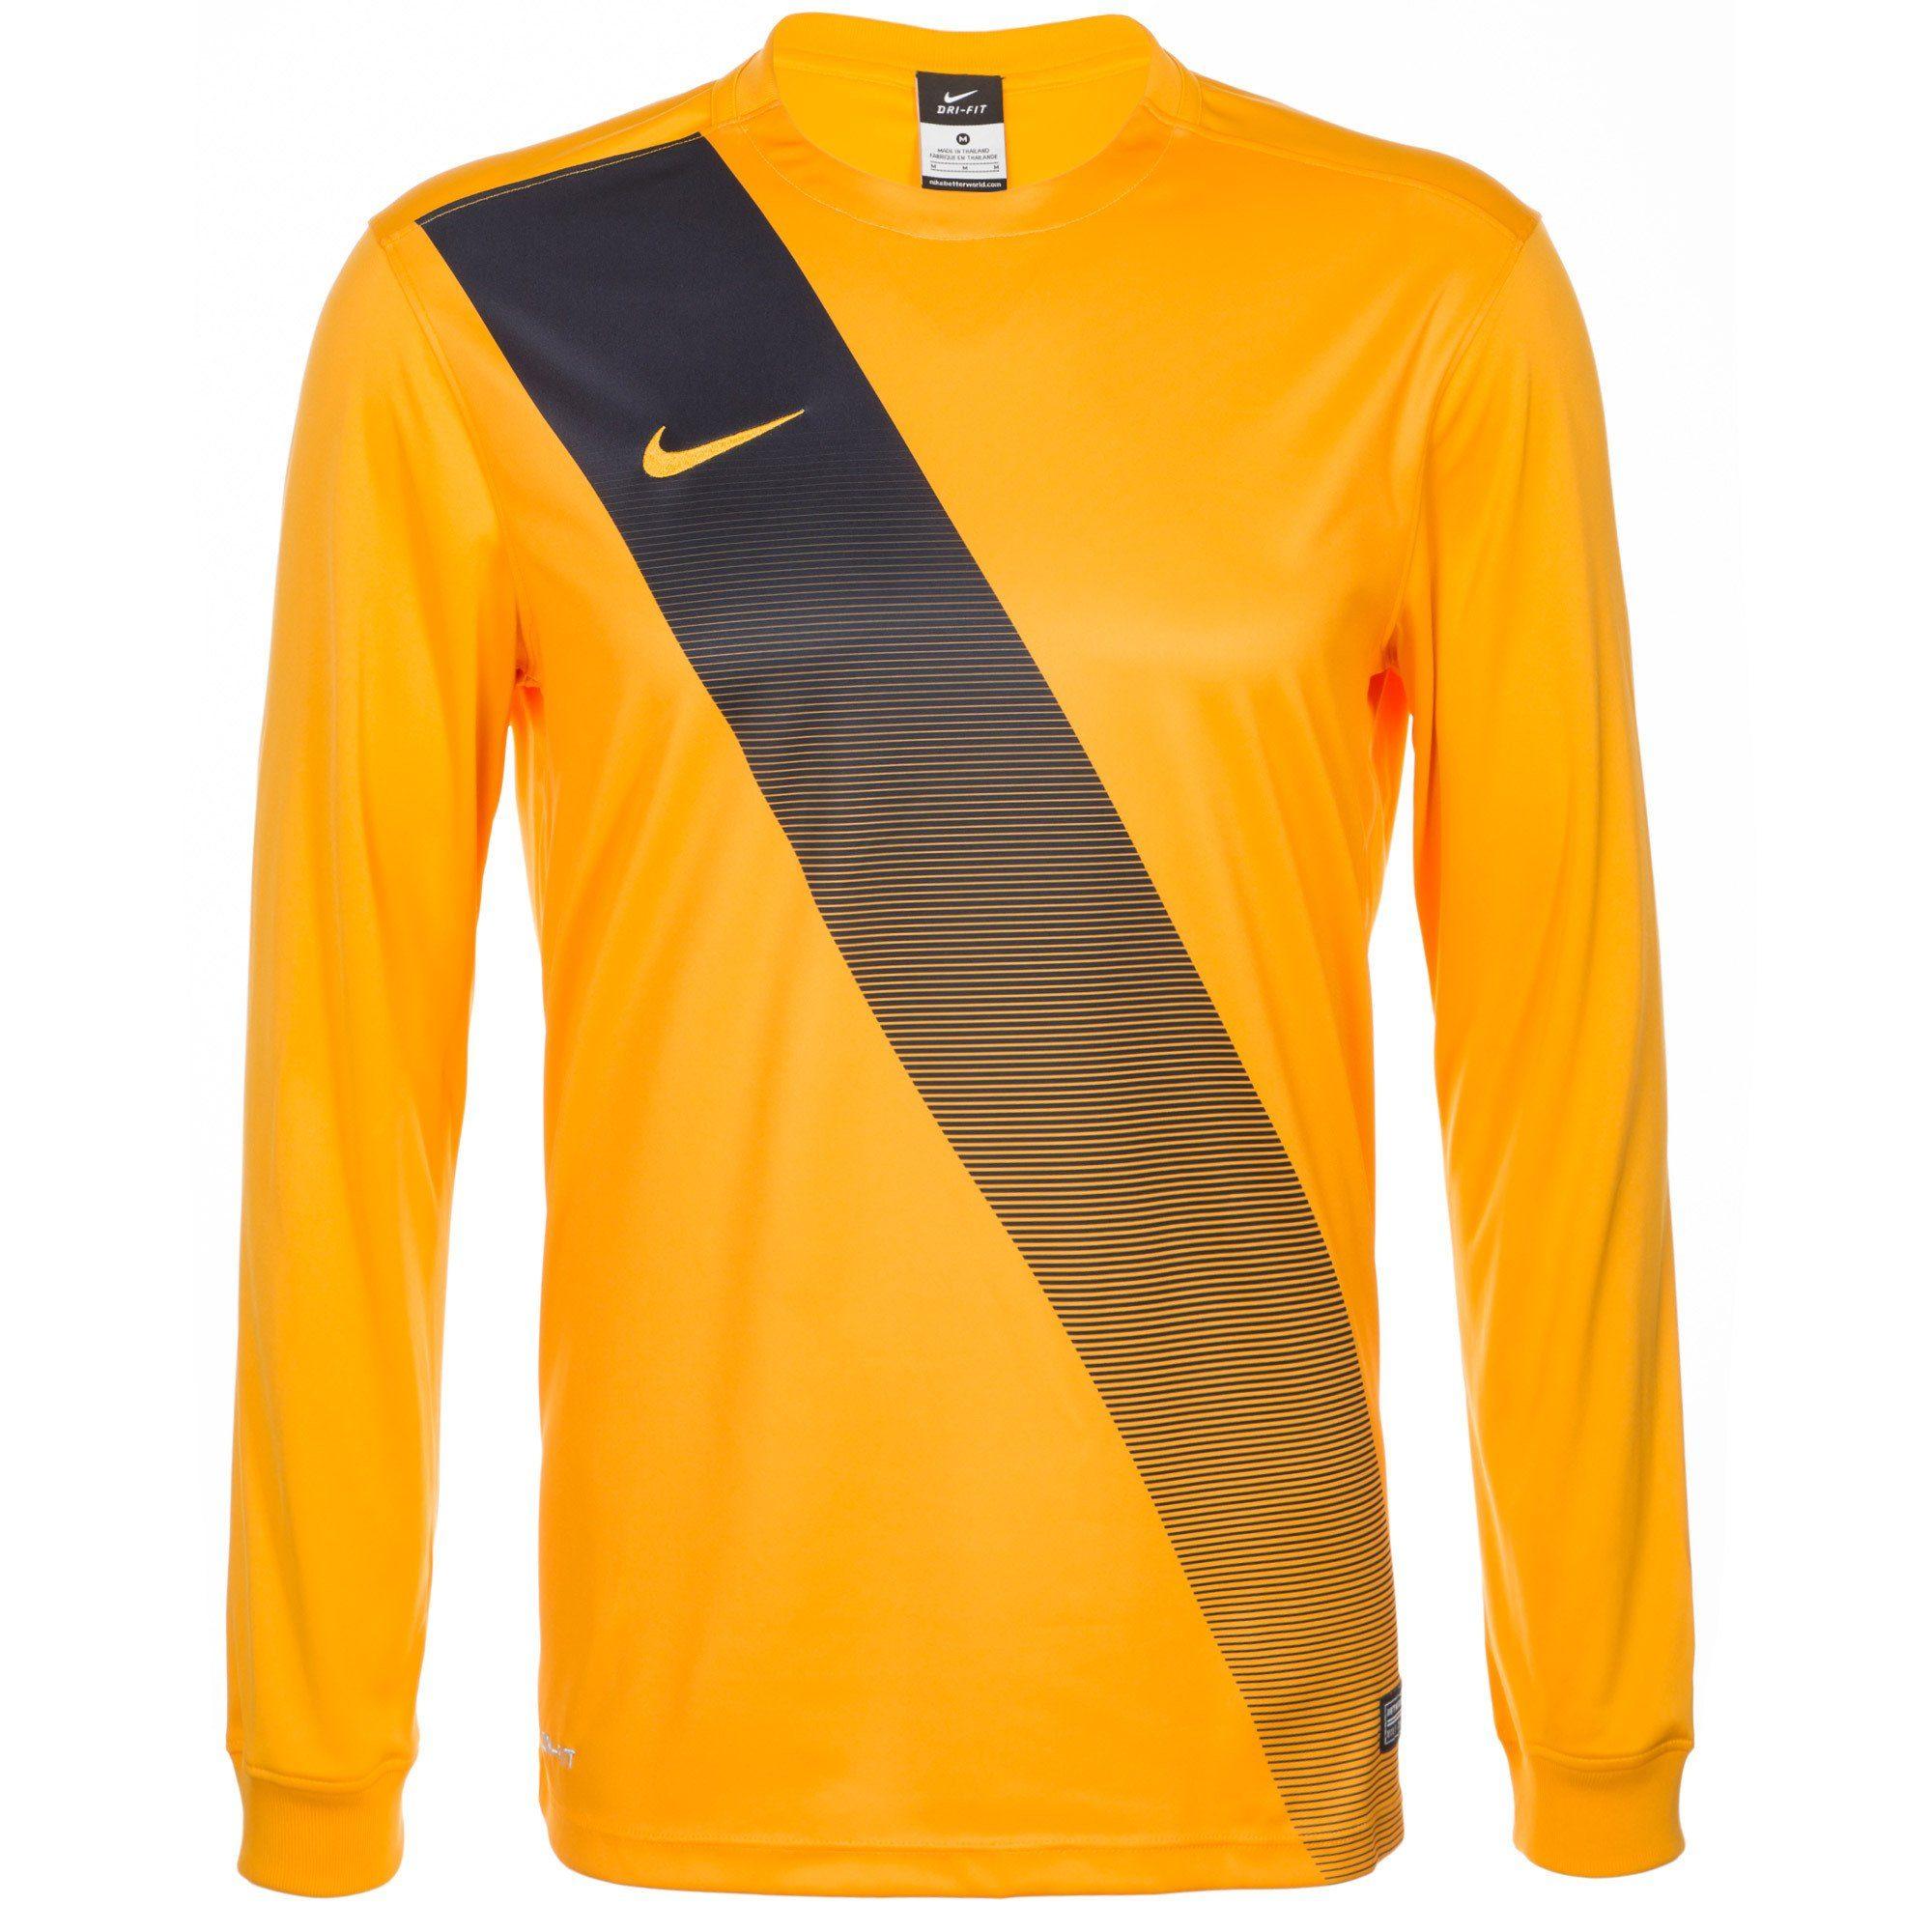 Nike Fußballtrikot Sash | Sportbekleidung > Trikots > Fußballtrikots | Nike